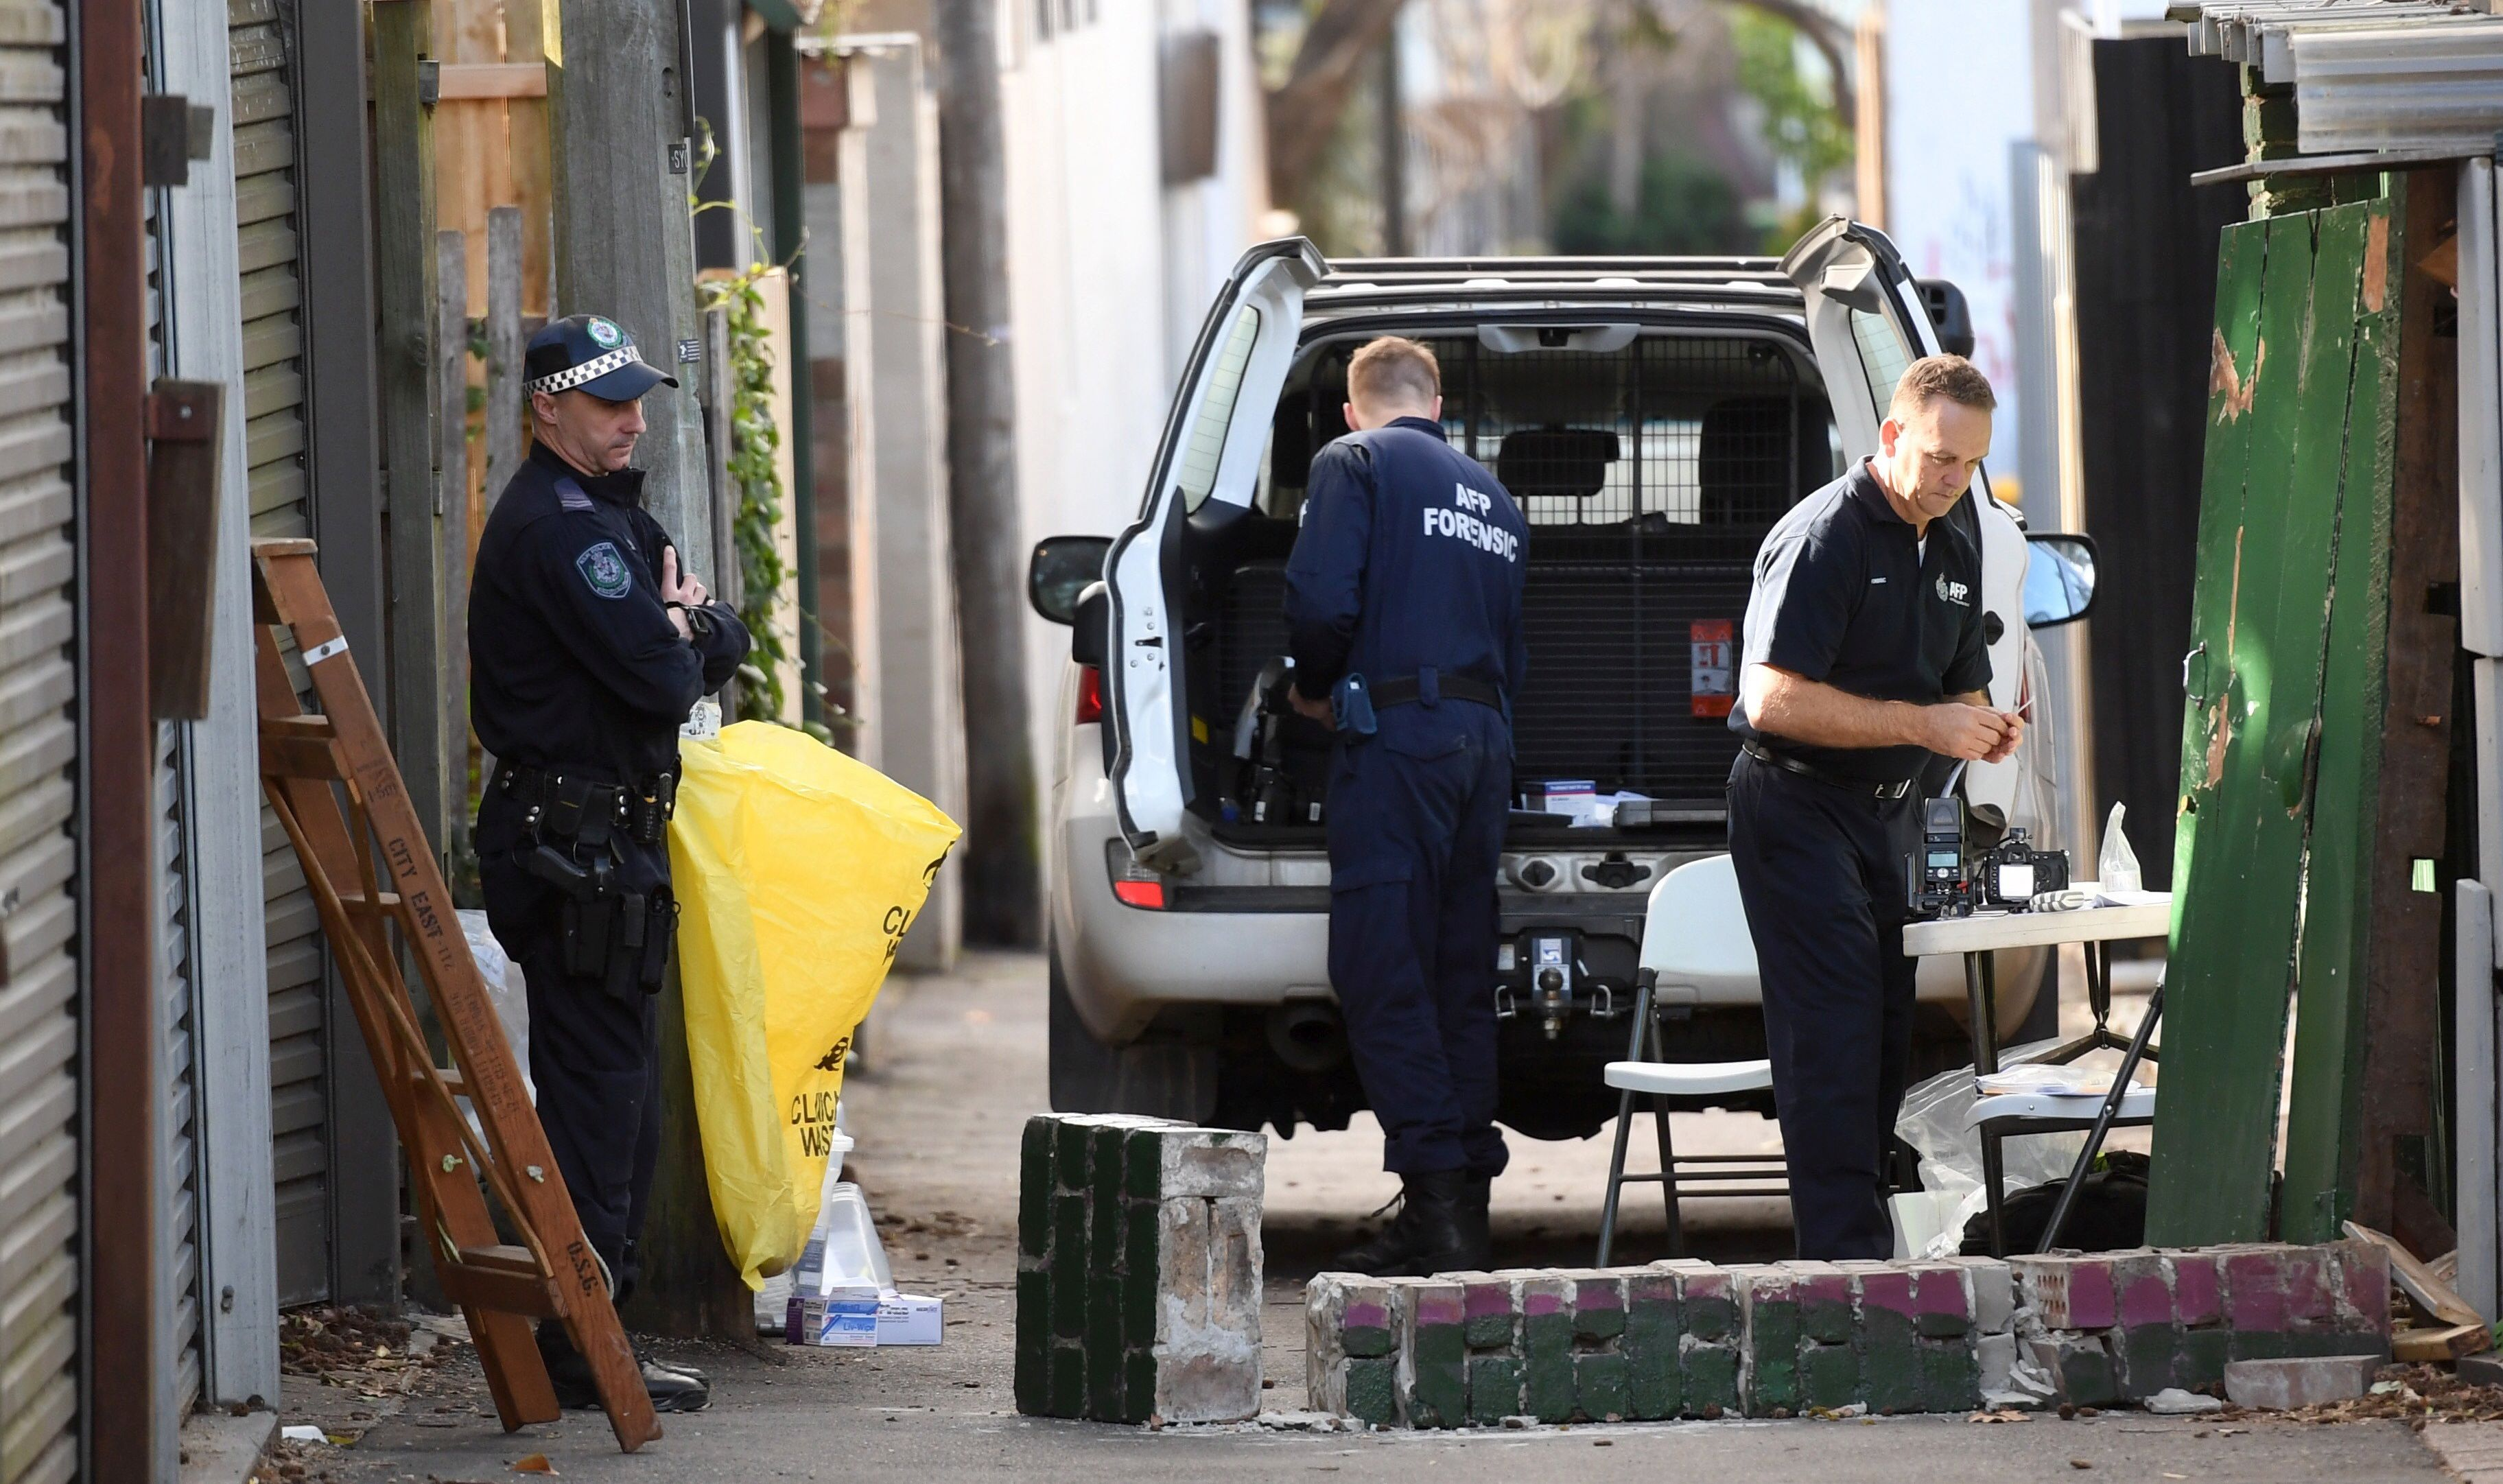 Tri osobe priznale krivnju za planiranje napada na australske vladine zgrade